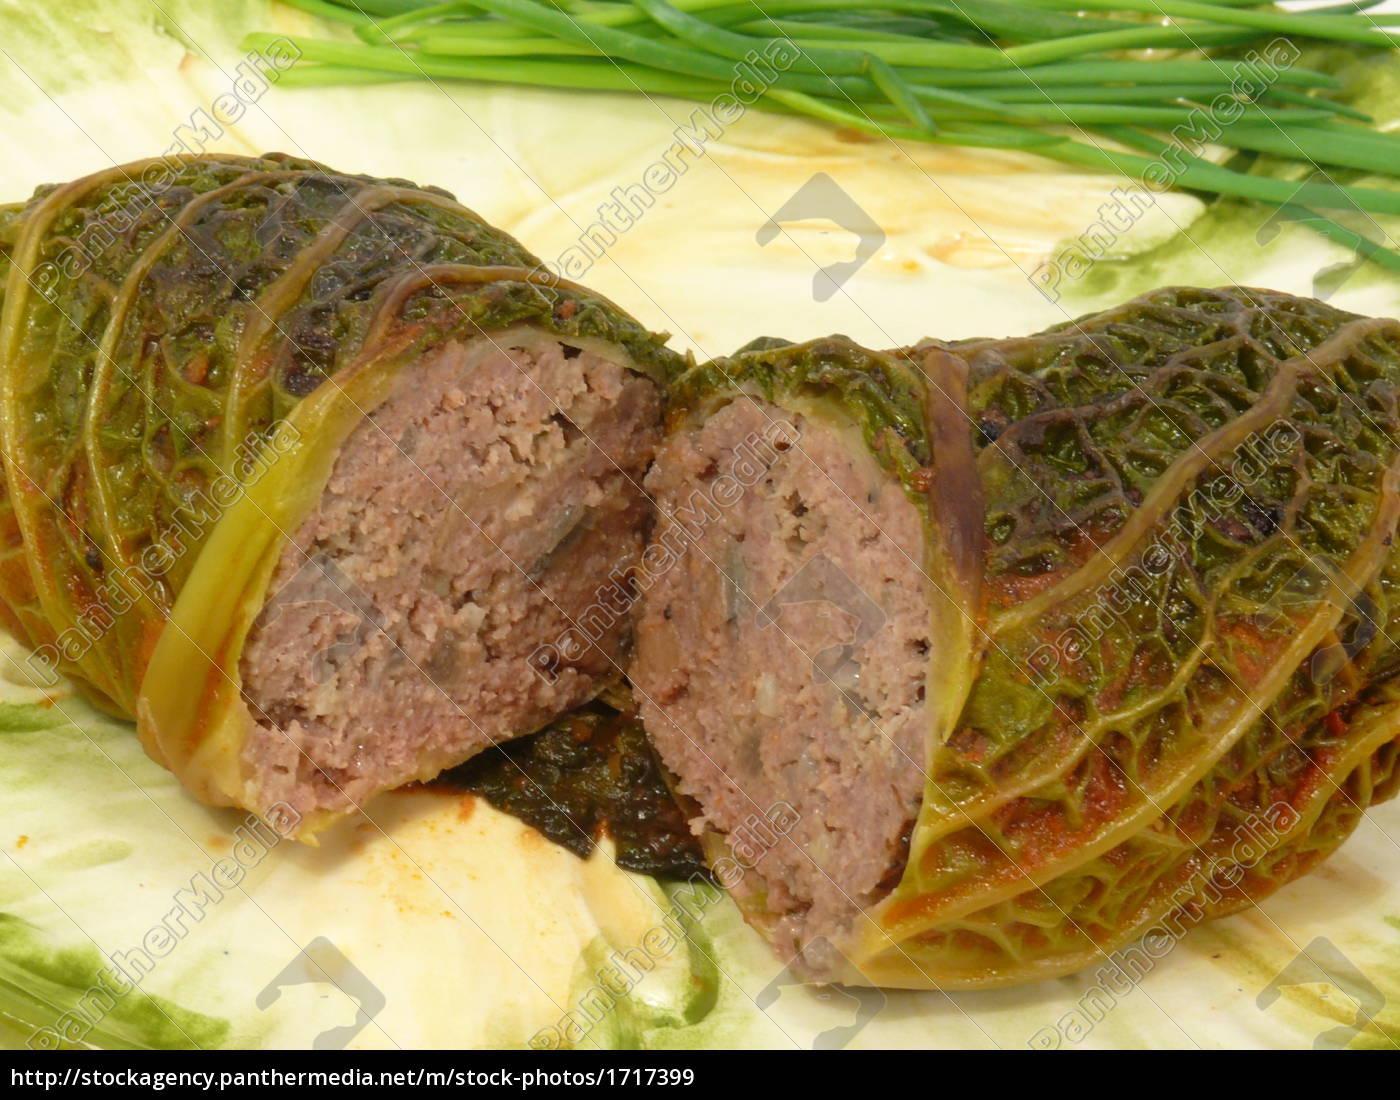 cabbage, rolls - 1717399